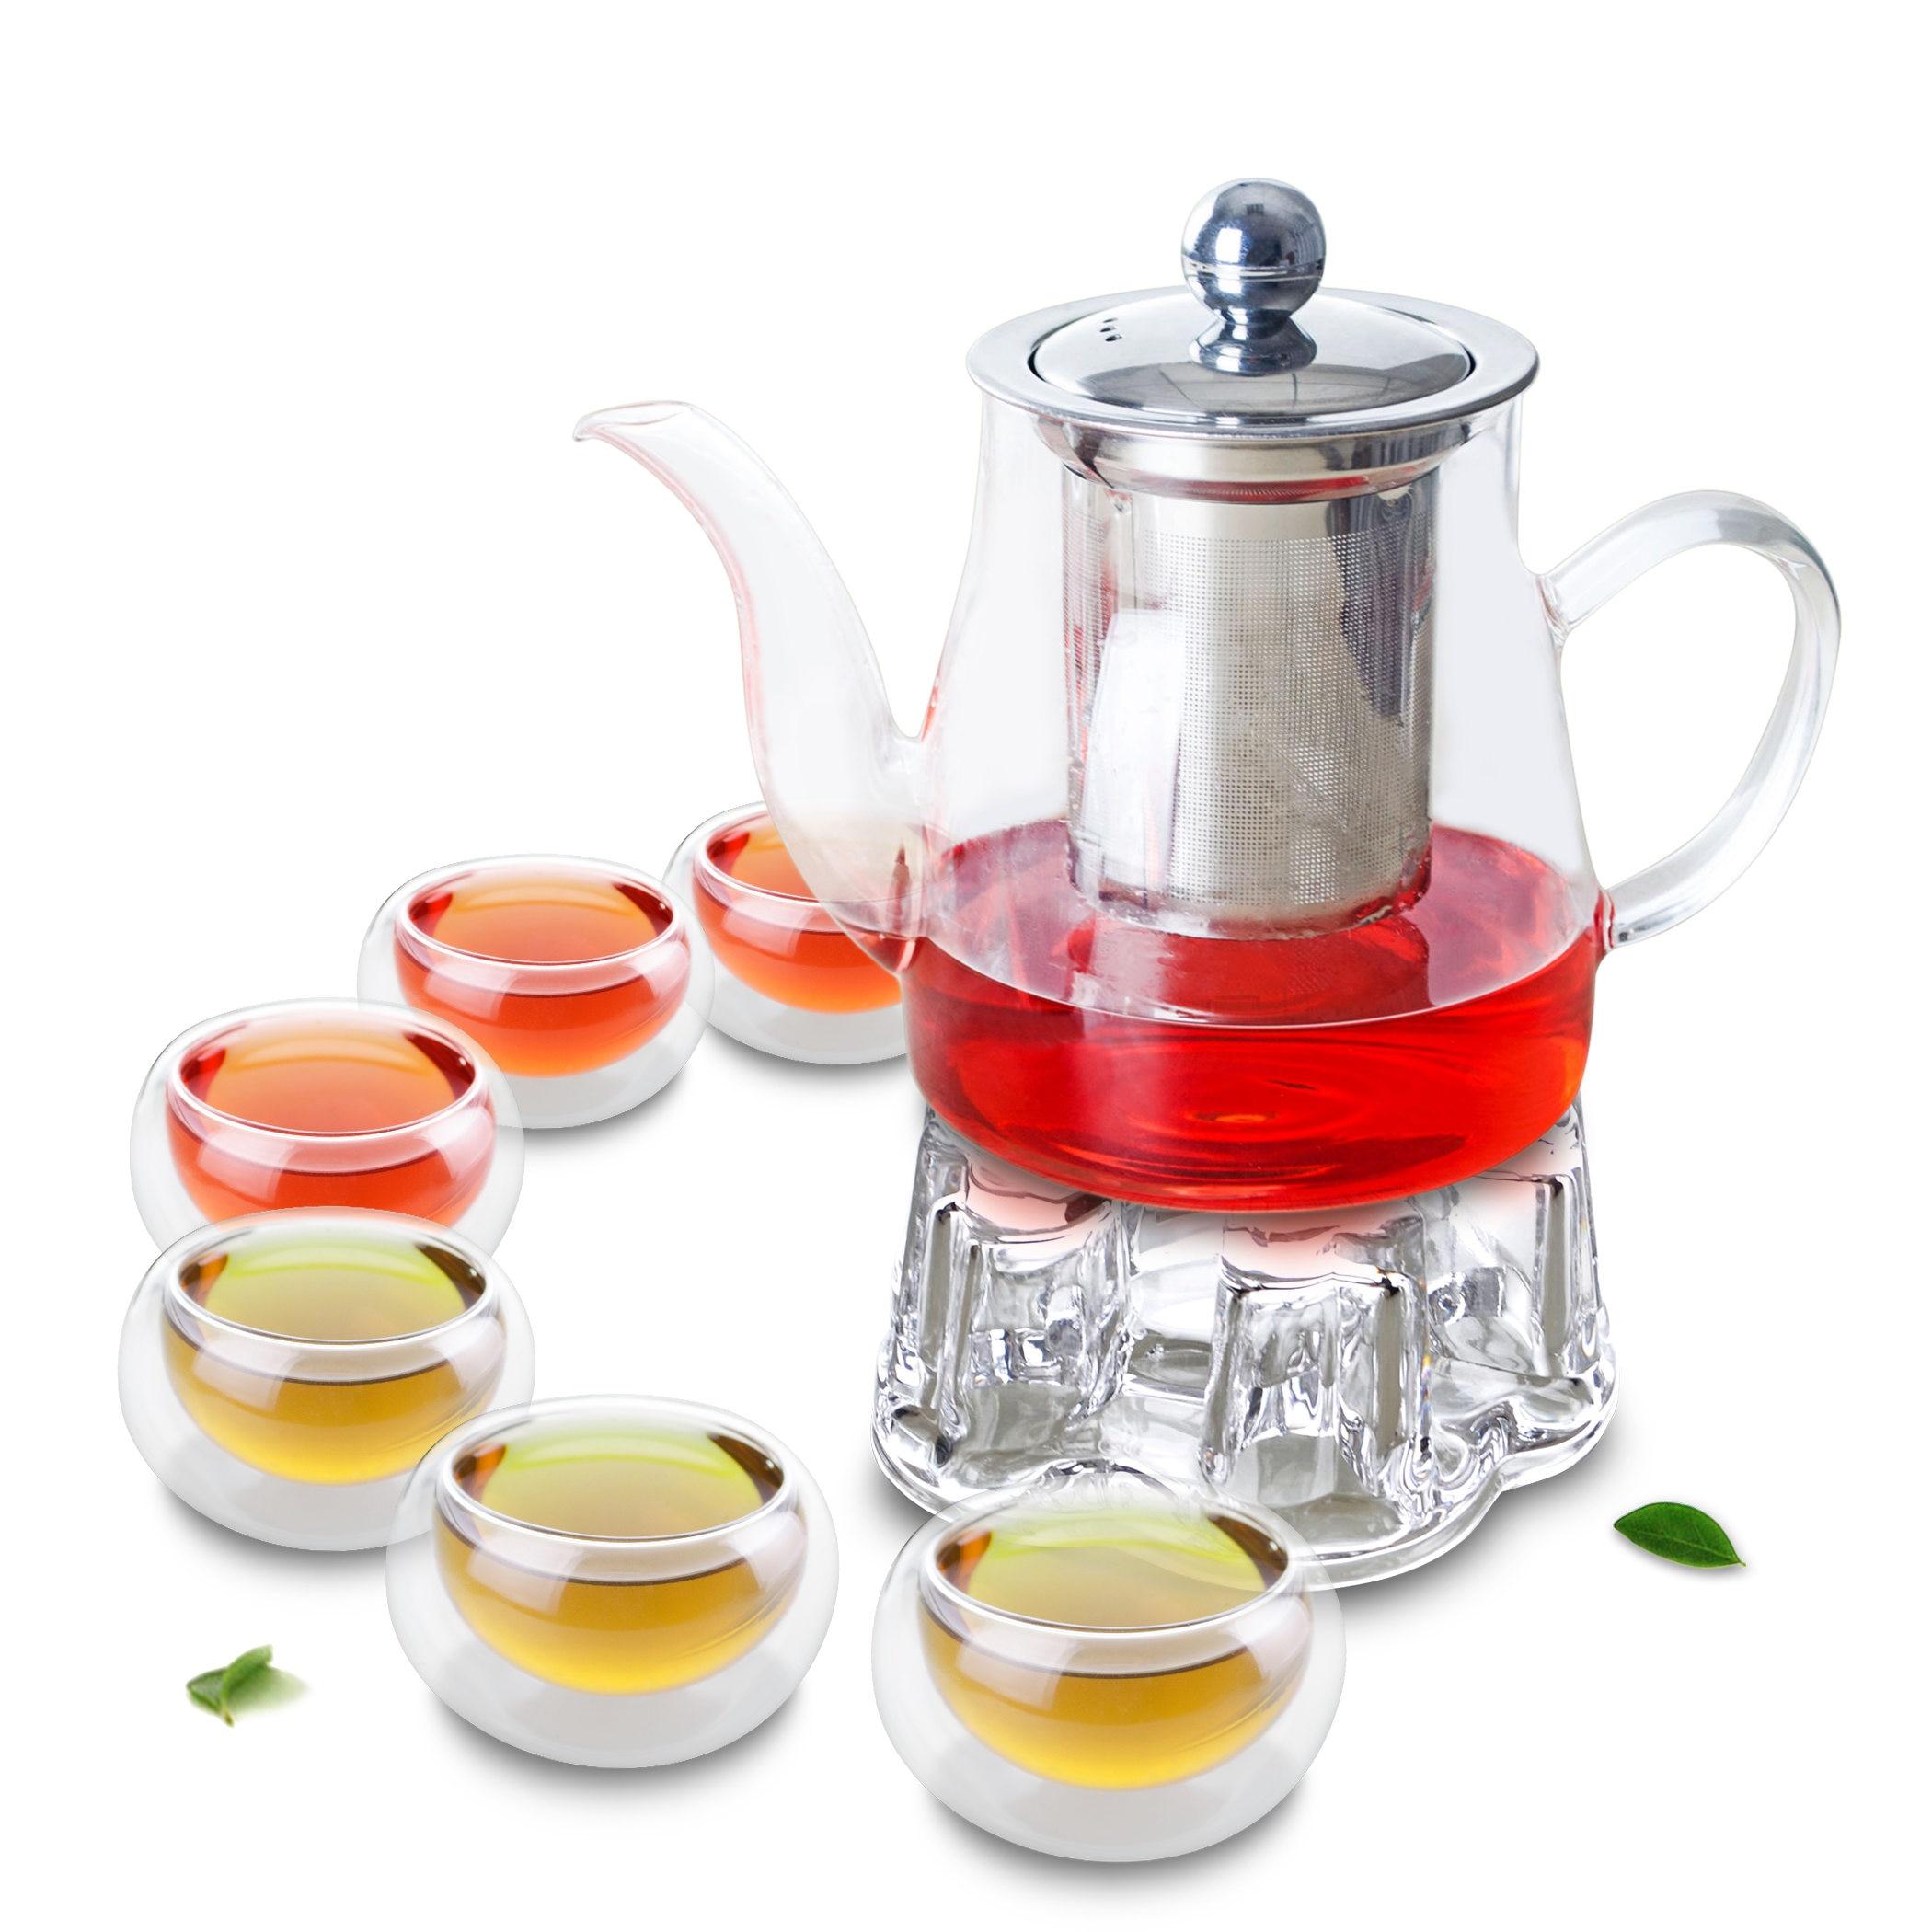 1x 8in1 الكونغ فو طقم شاي القهوة B-Big 740 مللي براد شاي زجاجي مع مساعد لتحليل الفولاذ + الكريستال دفئا B + 6 * كوب طبقة جدار مزدوج